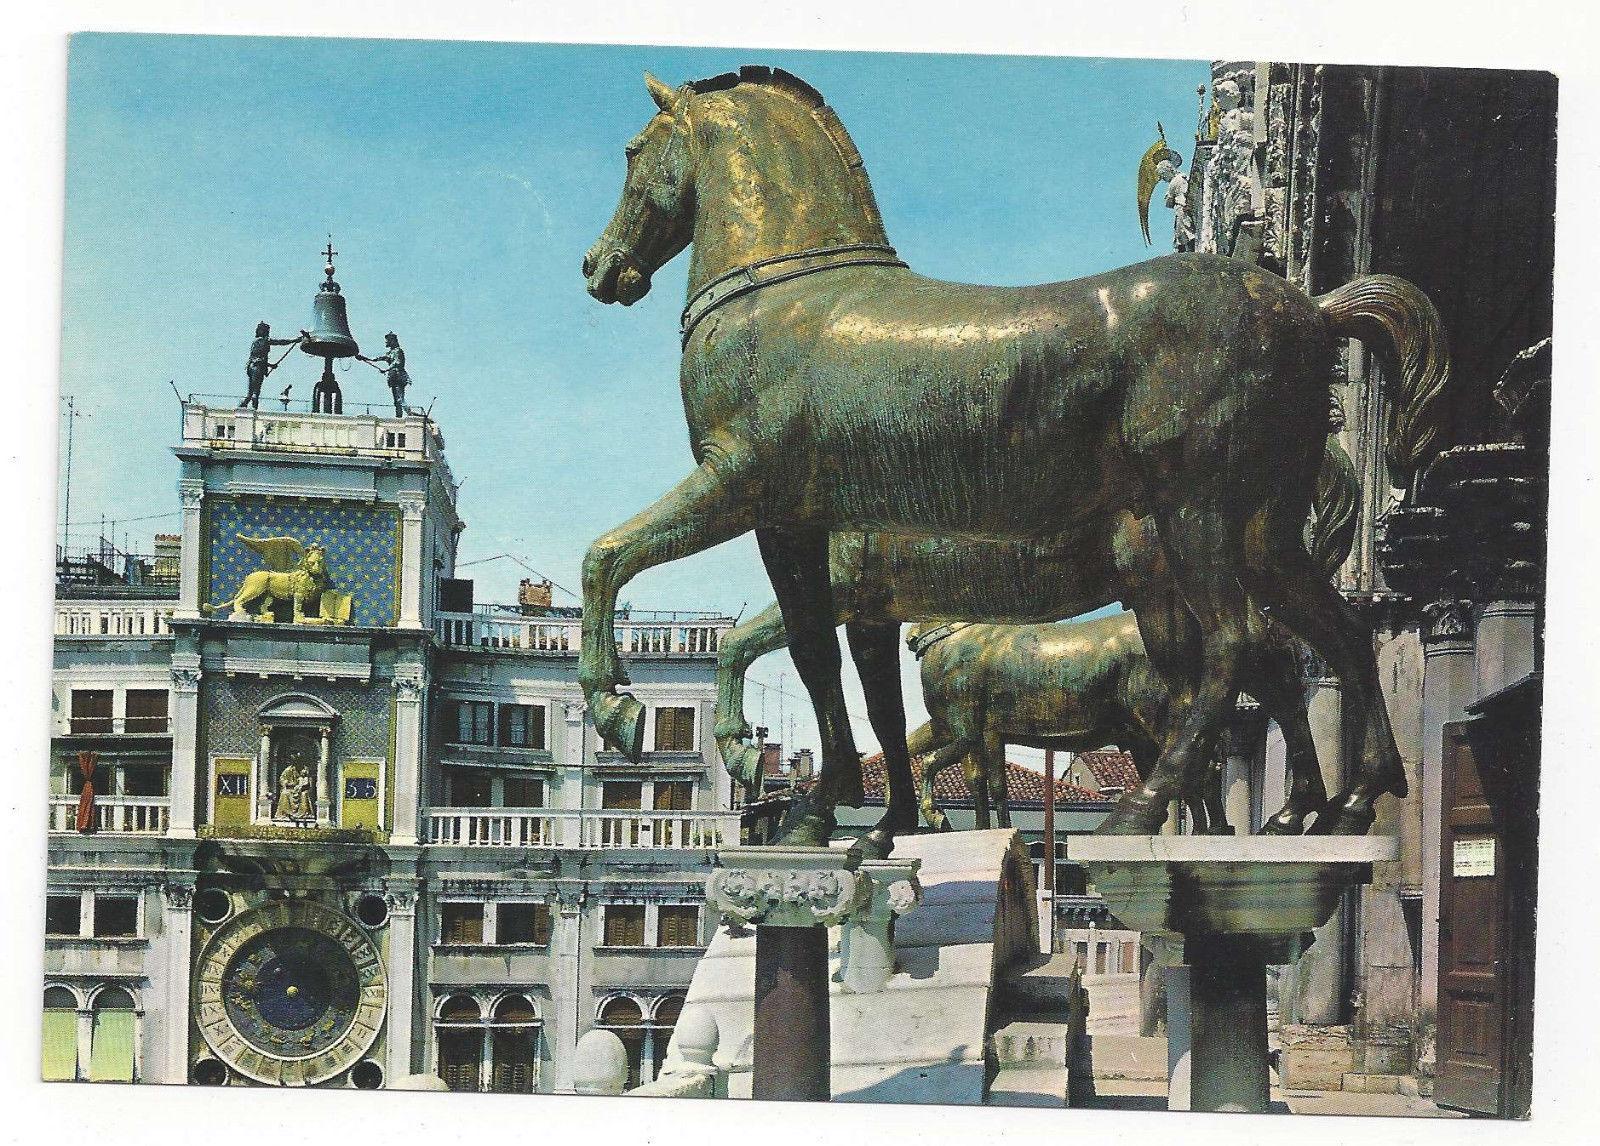 Italy Venice Basilica St Mark Clock Tower Horses Venezia Vtg Postcard 4X6